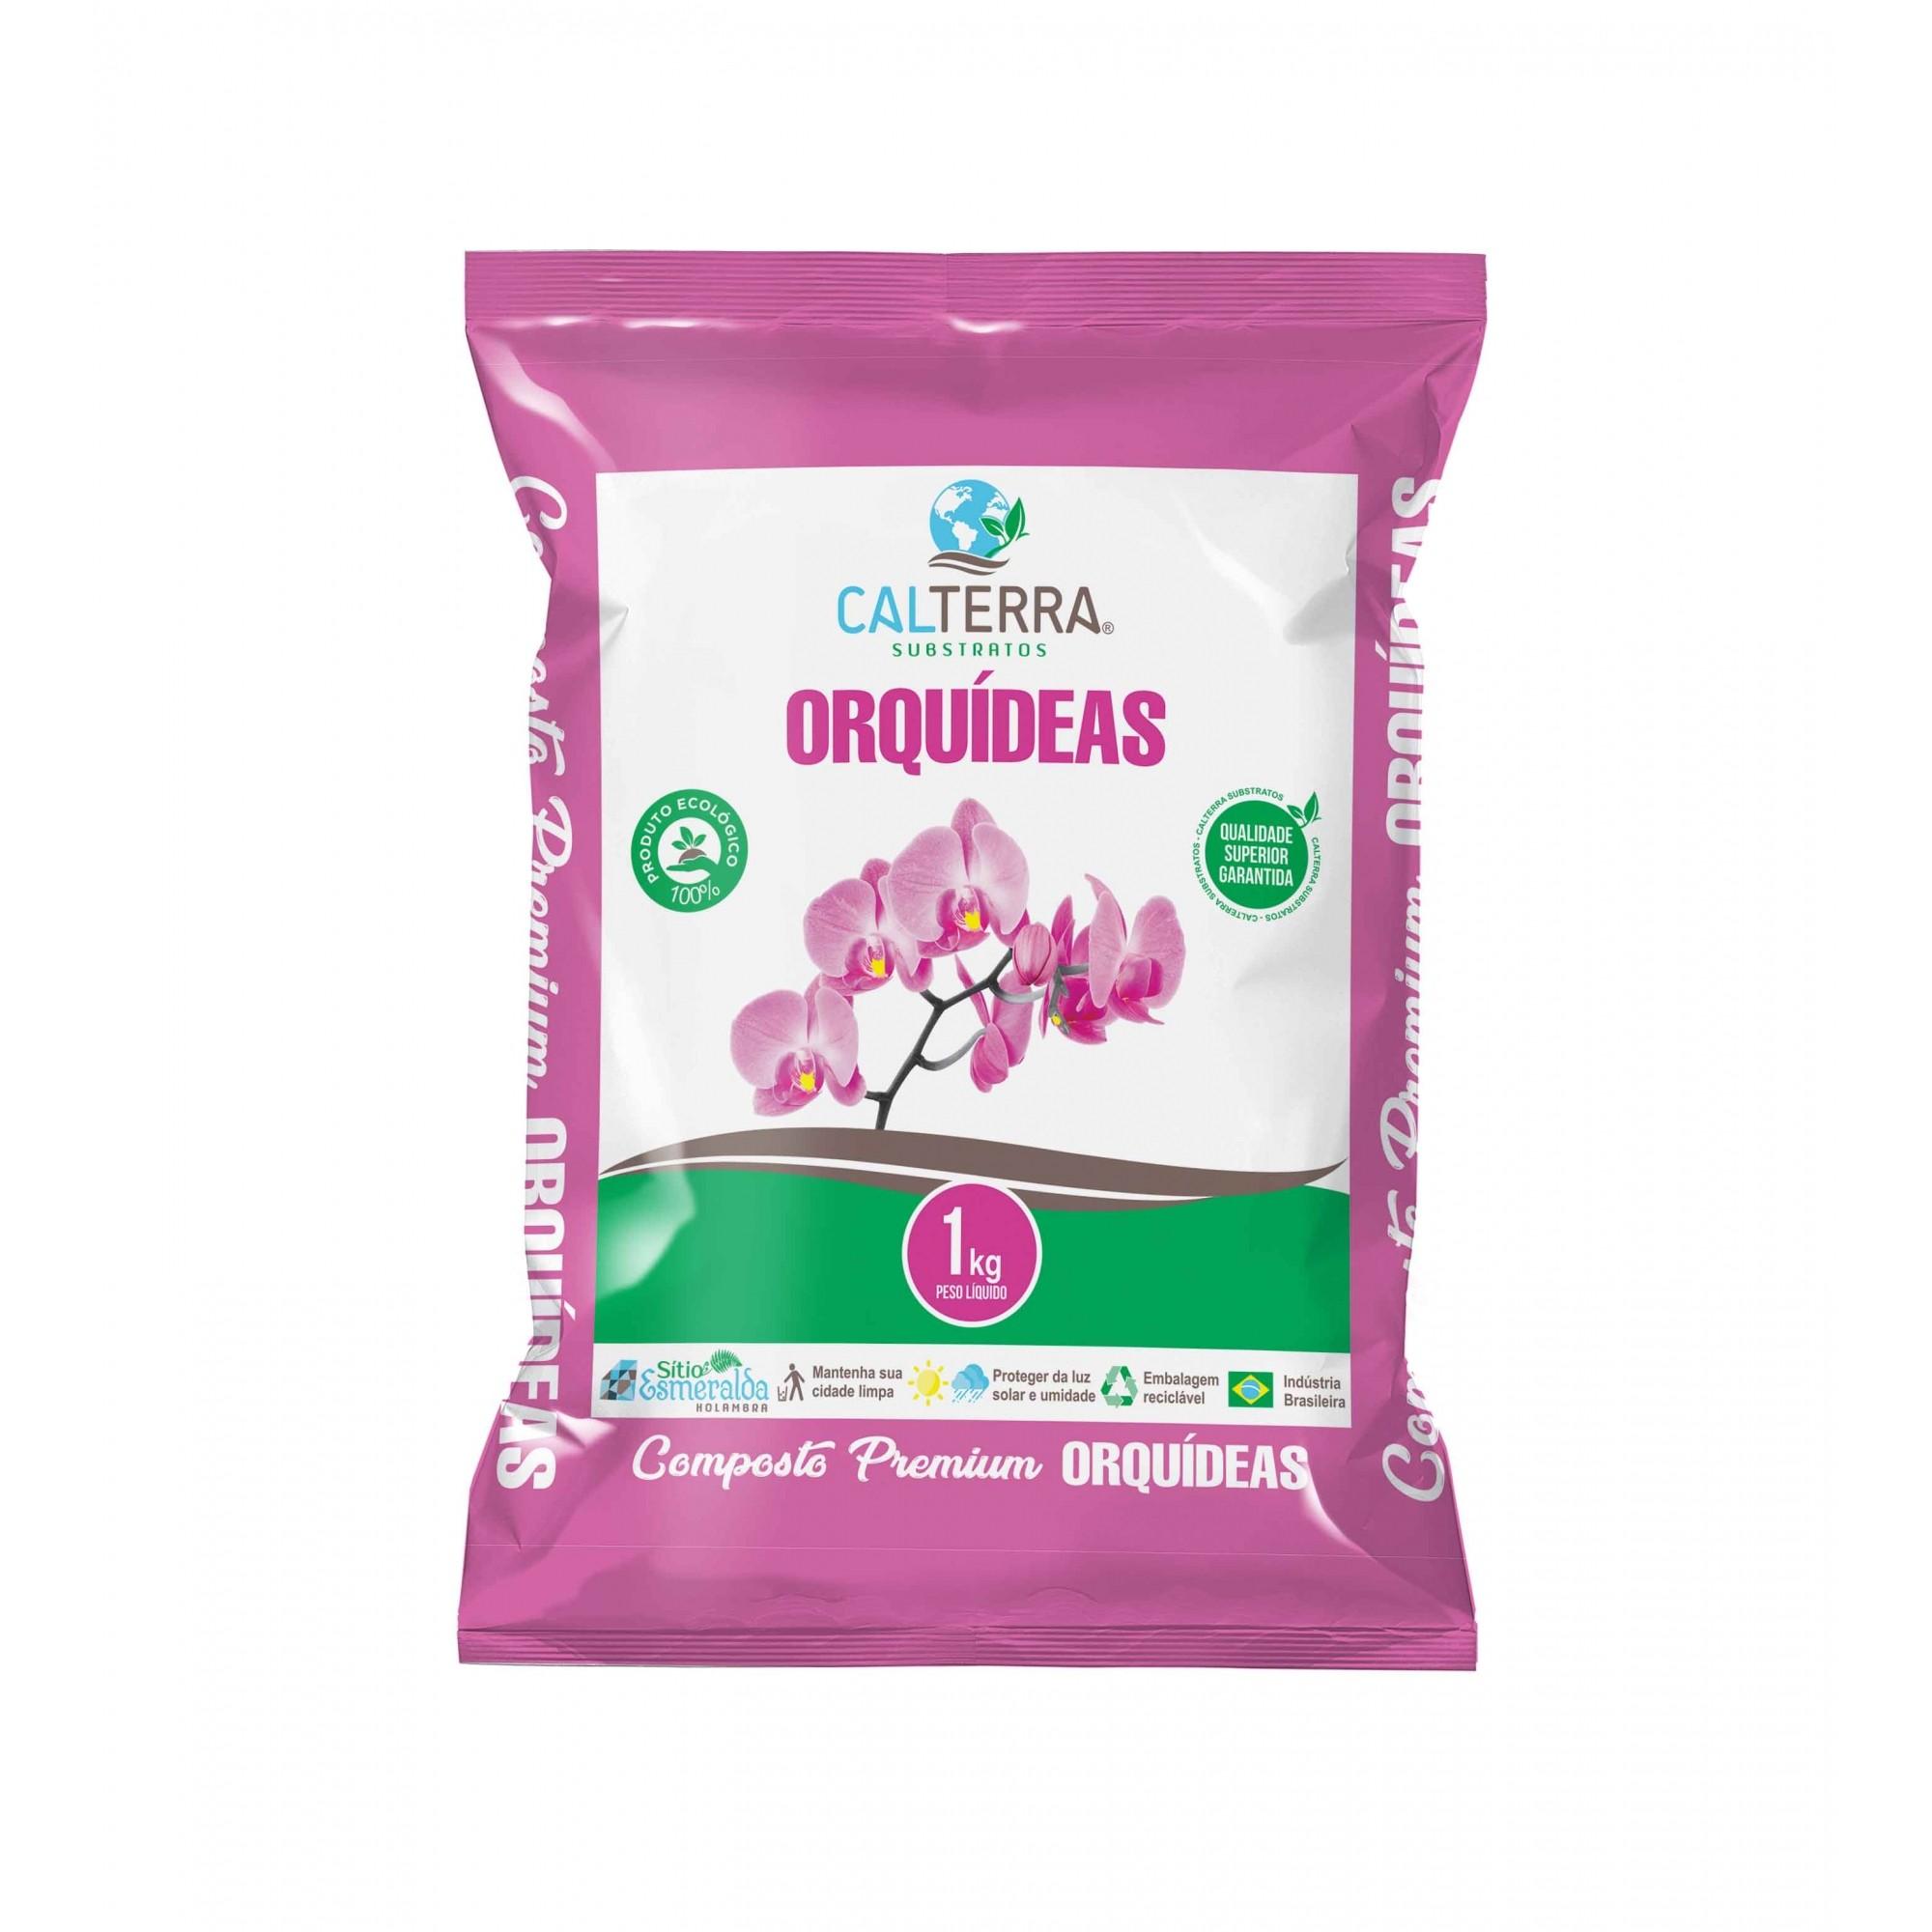 Substrato Composto Premium Orquídeas 1kg Calterra